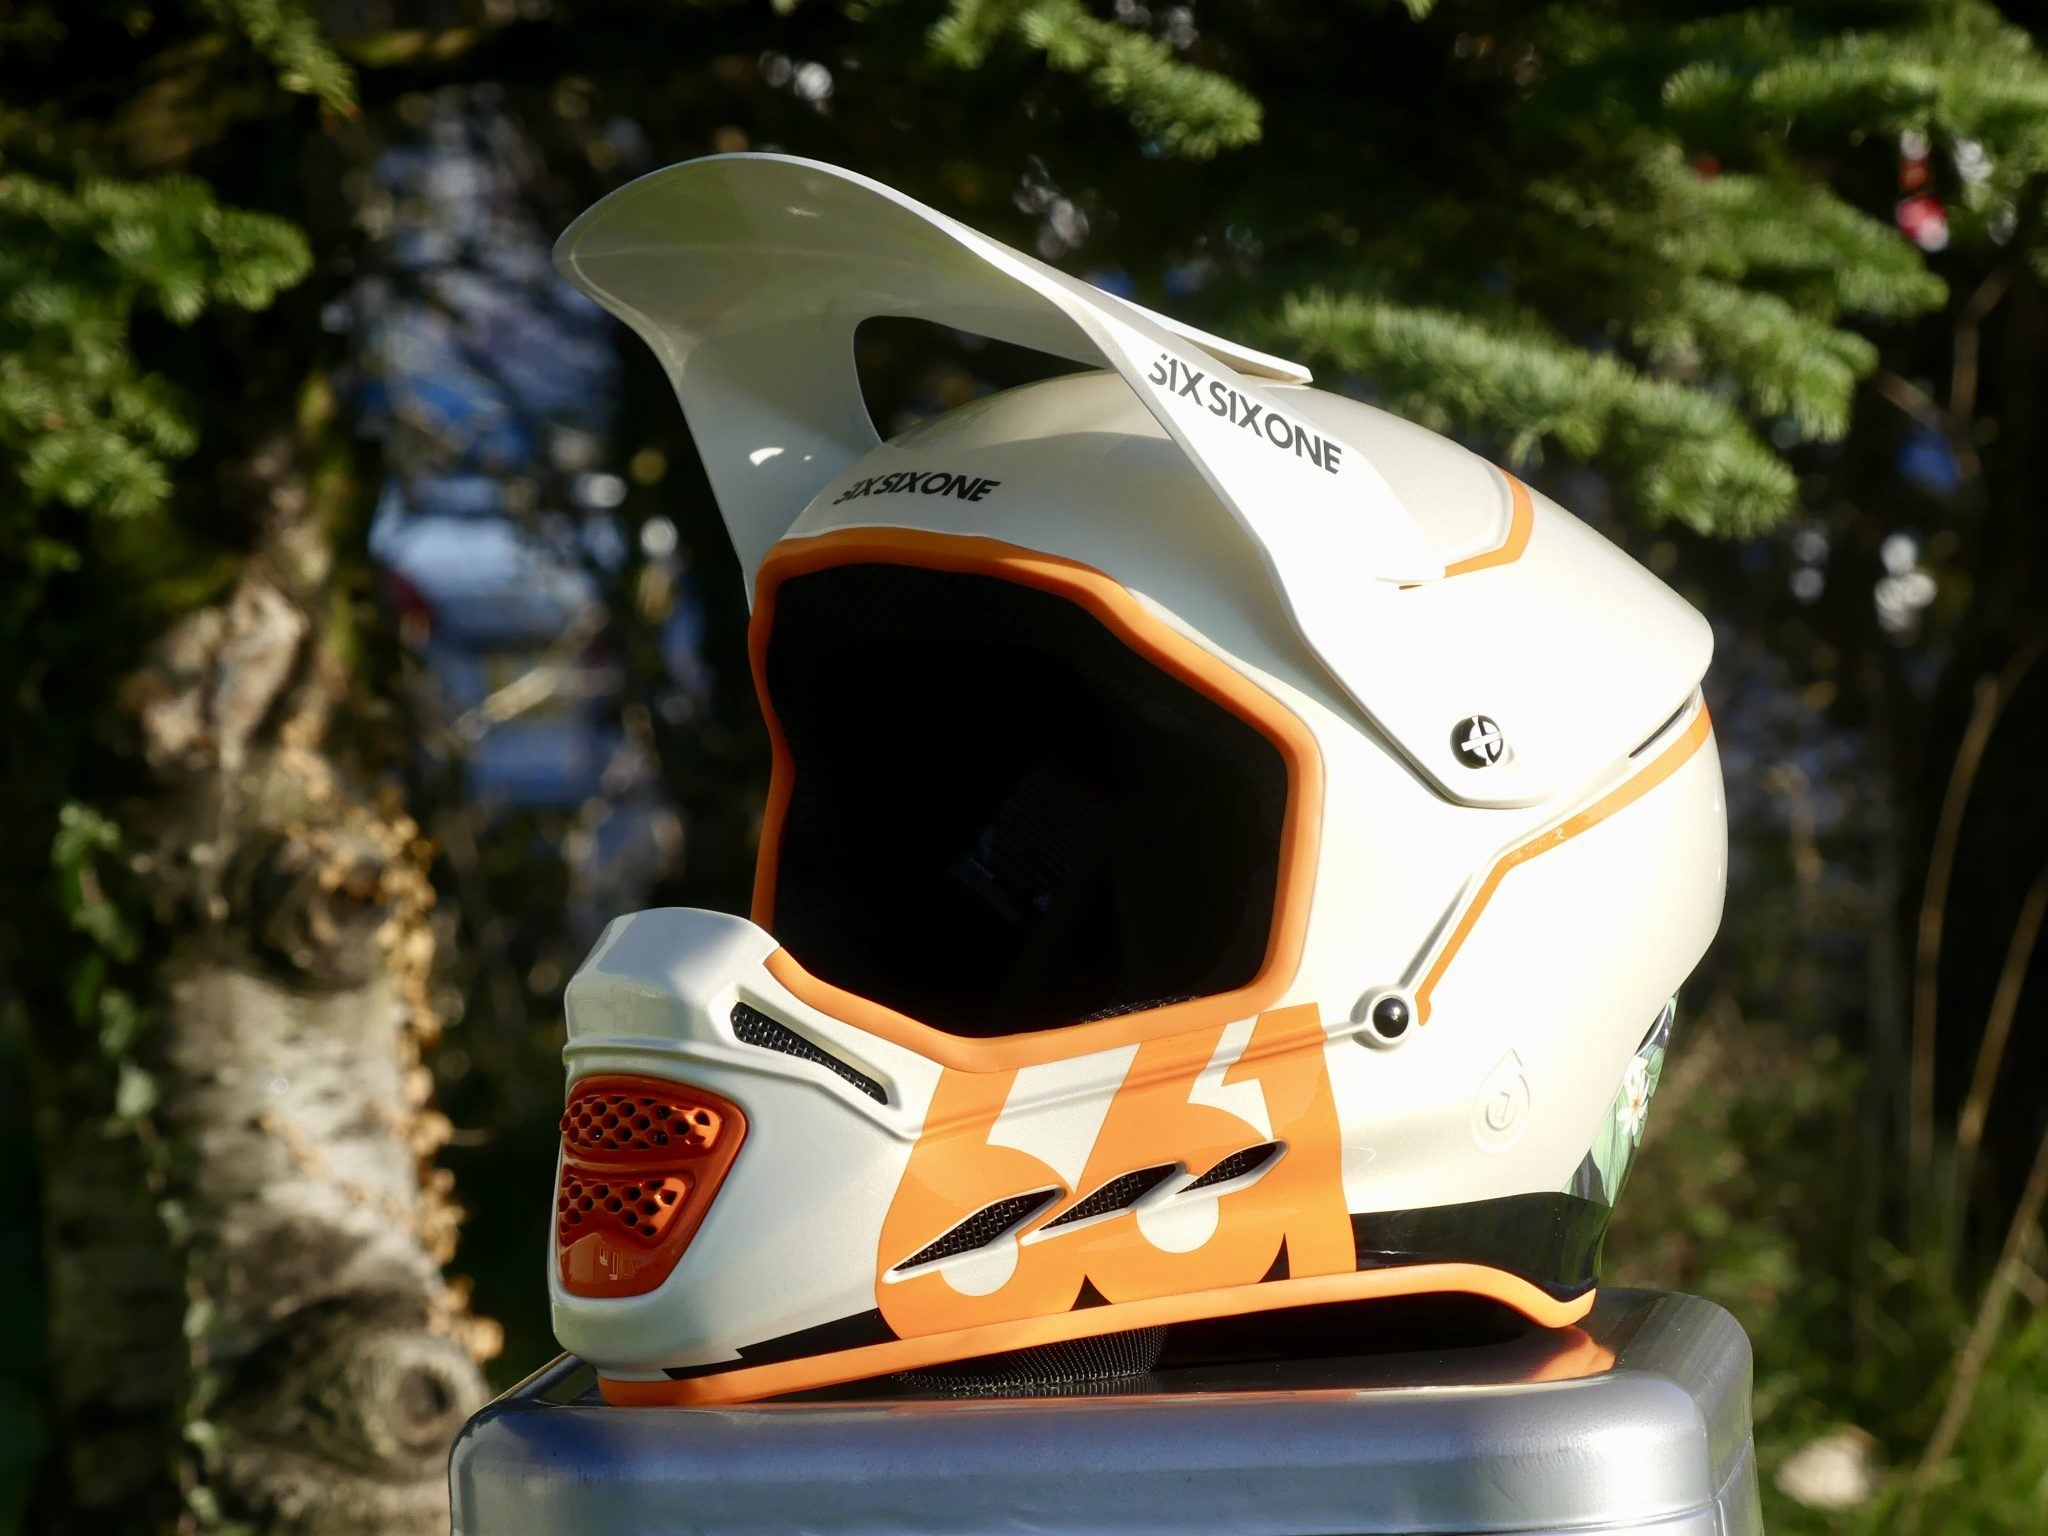 Sixsixone 661 Reset Helmet Visor Peak White